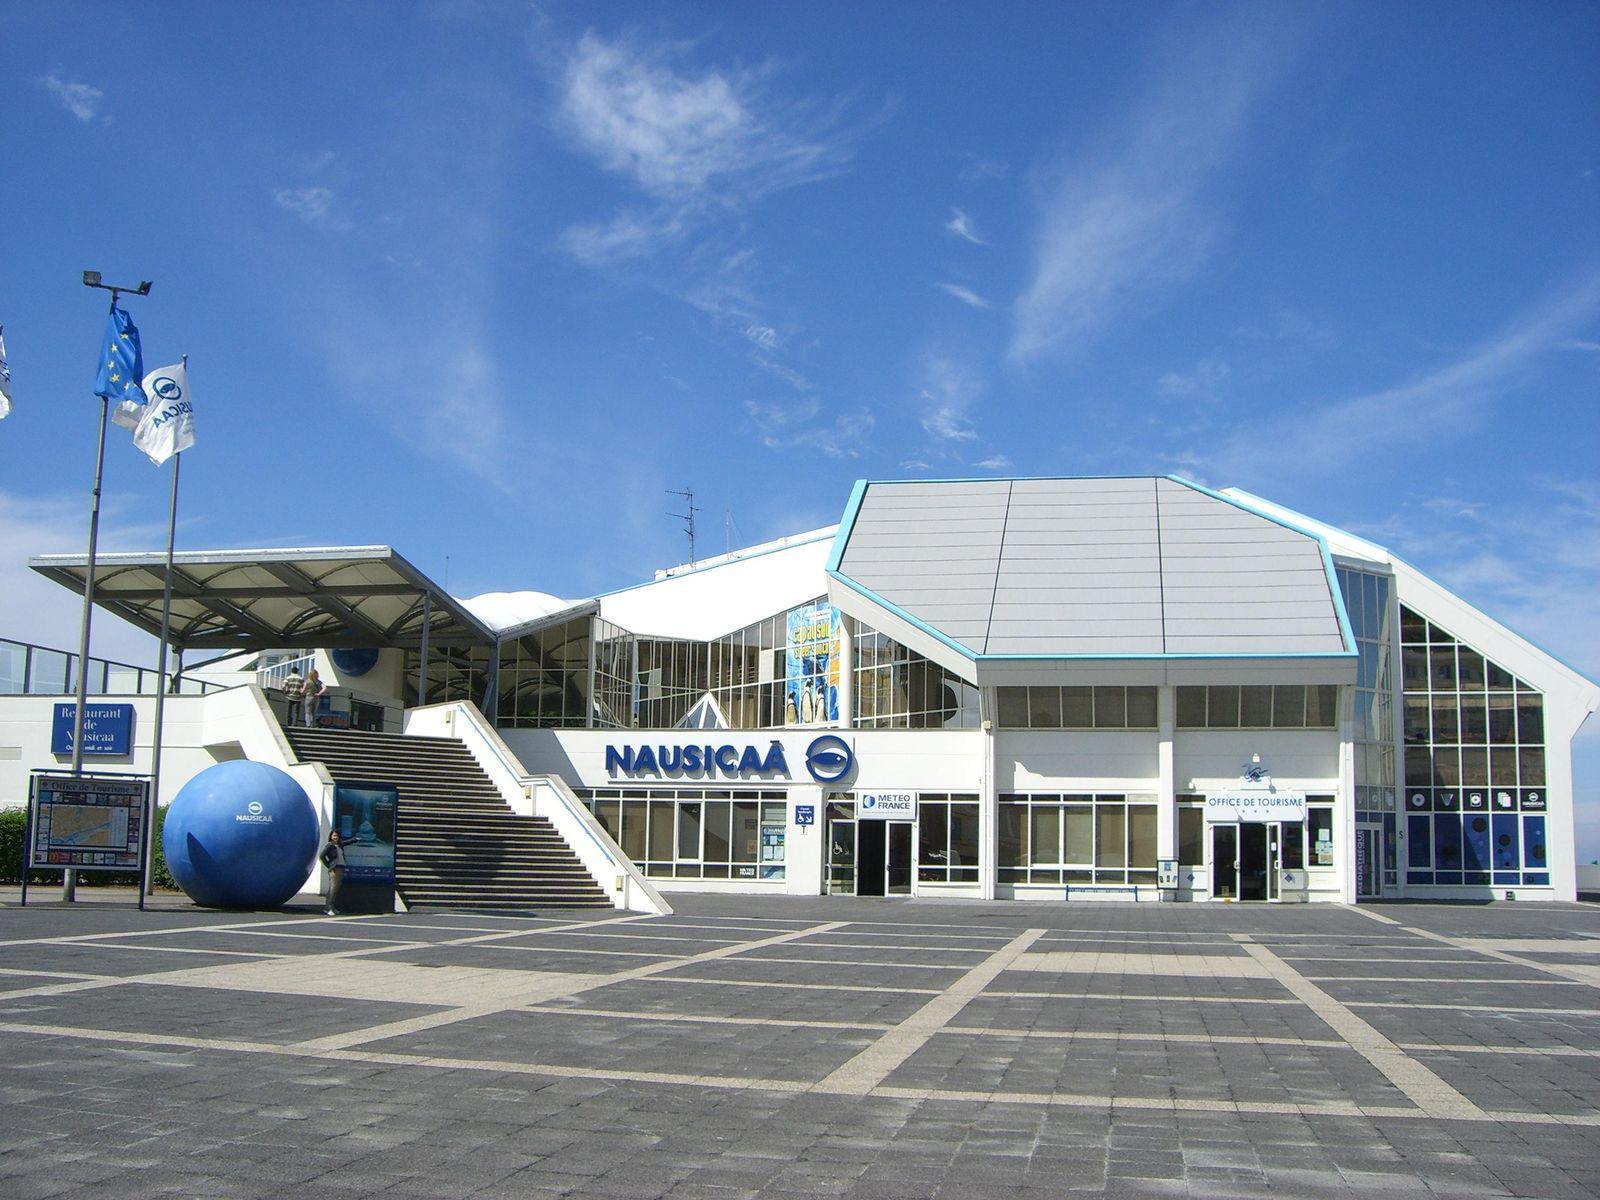 Nausicaä_Boulogne-sur-Mer